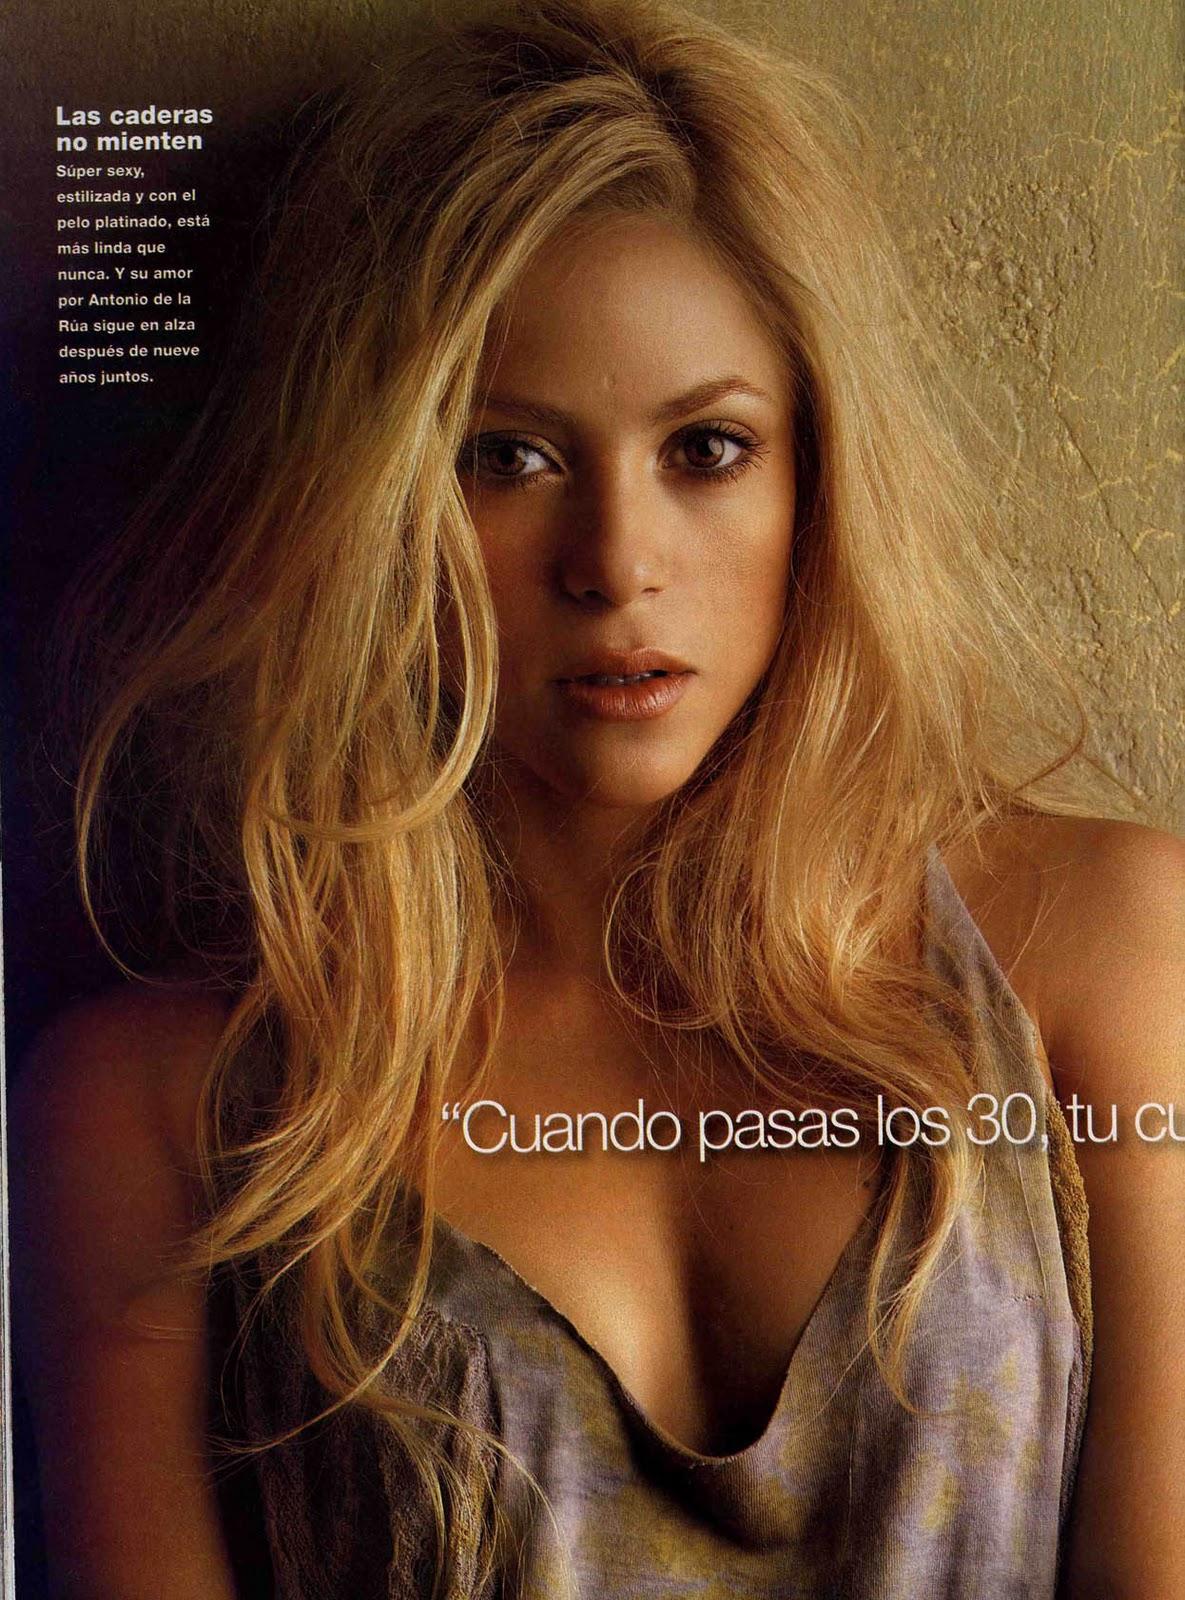 http://2.bp.blogspot.com/_83miS7TrWDY/TGSWrmv2SNI/AAAAAAAABI0/DtoVPeLCW84/s1600/shakira_gente_magazine_2.jpg